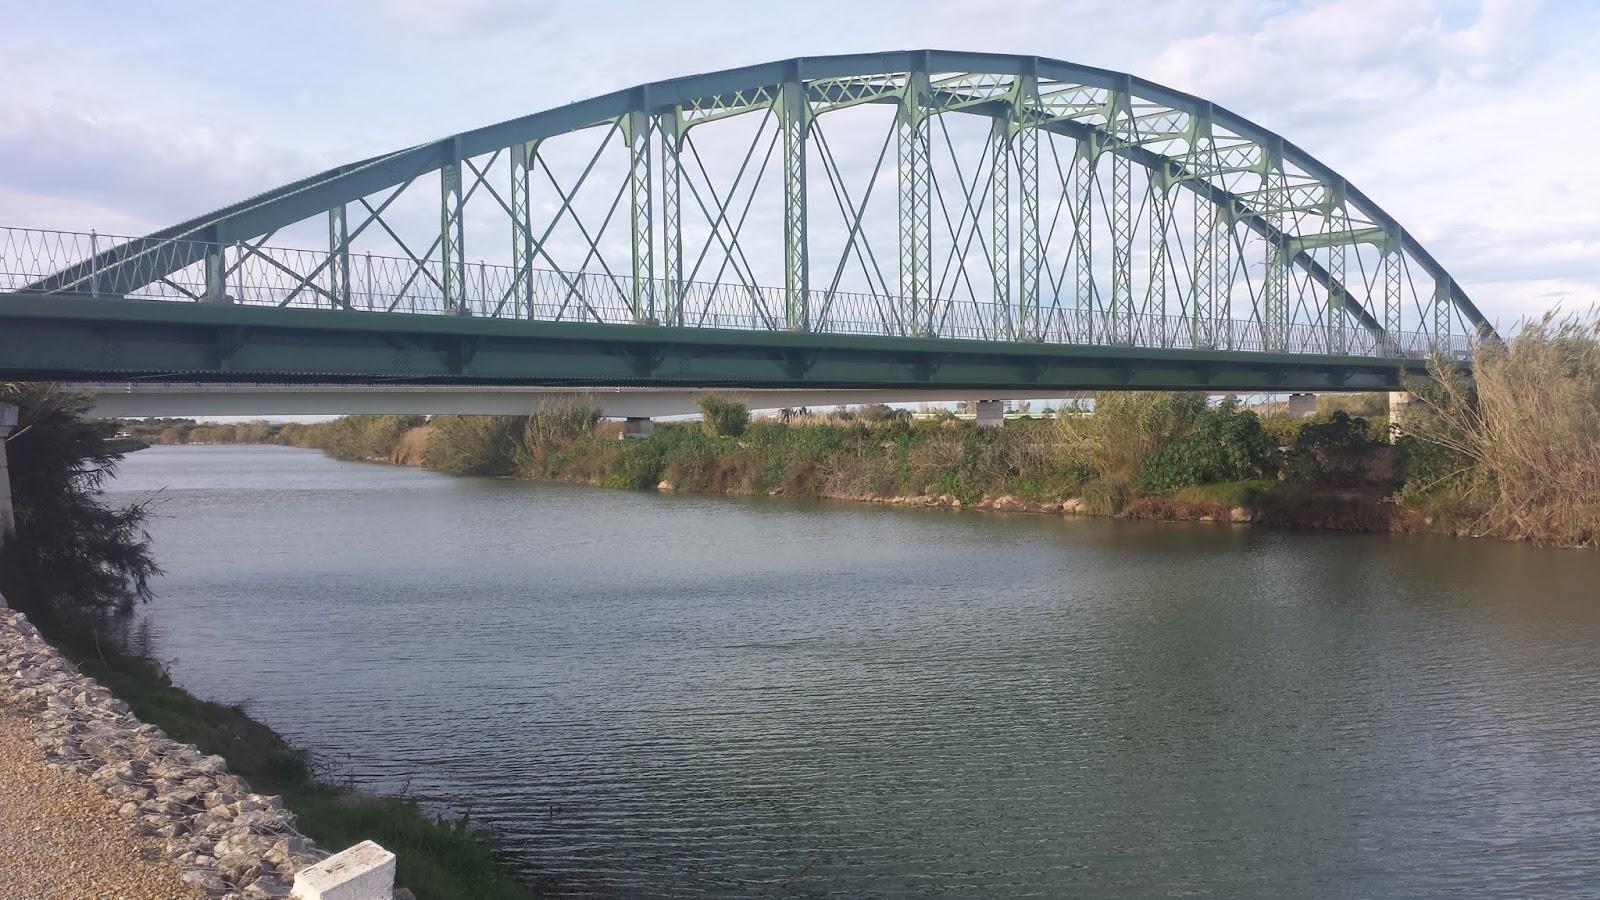 Alfonso XIII iron bridge over the River Júcar